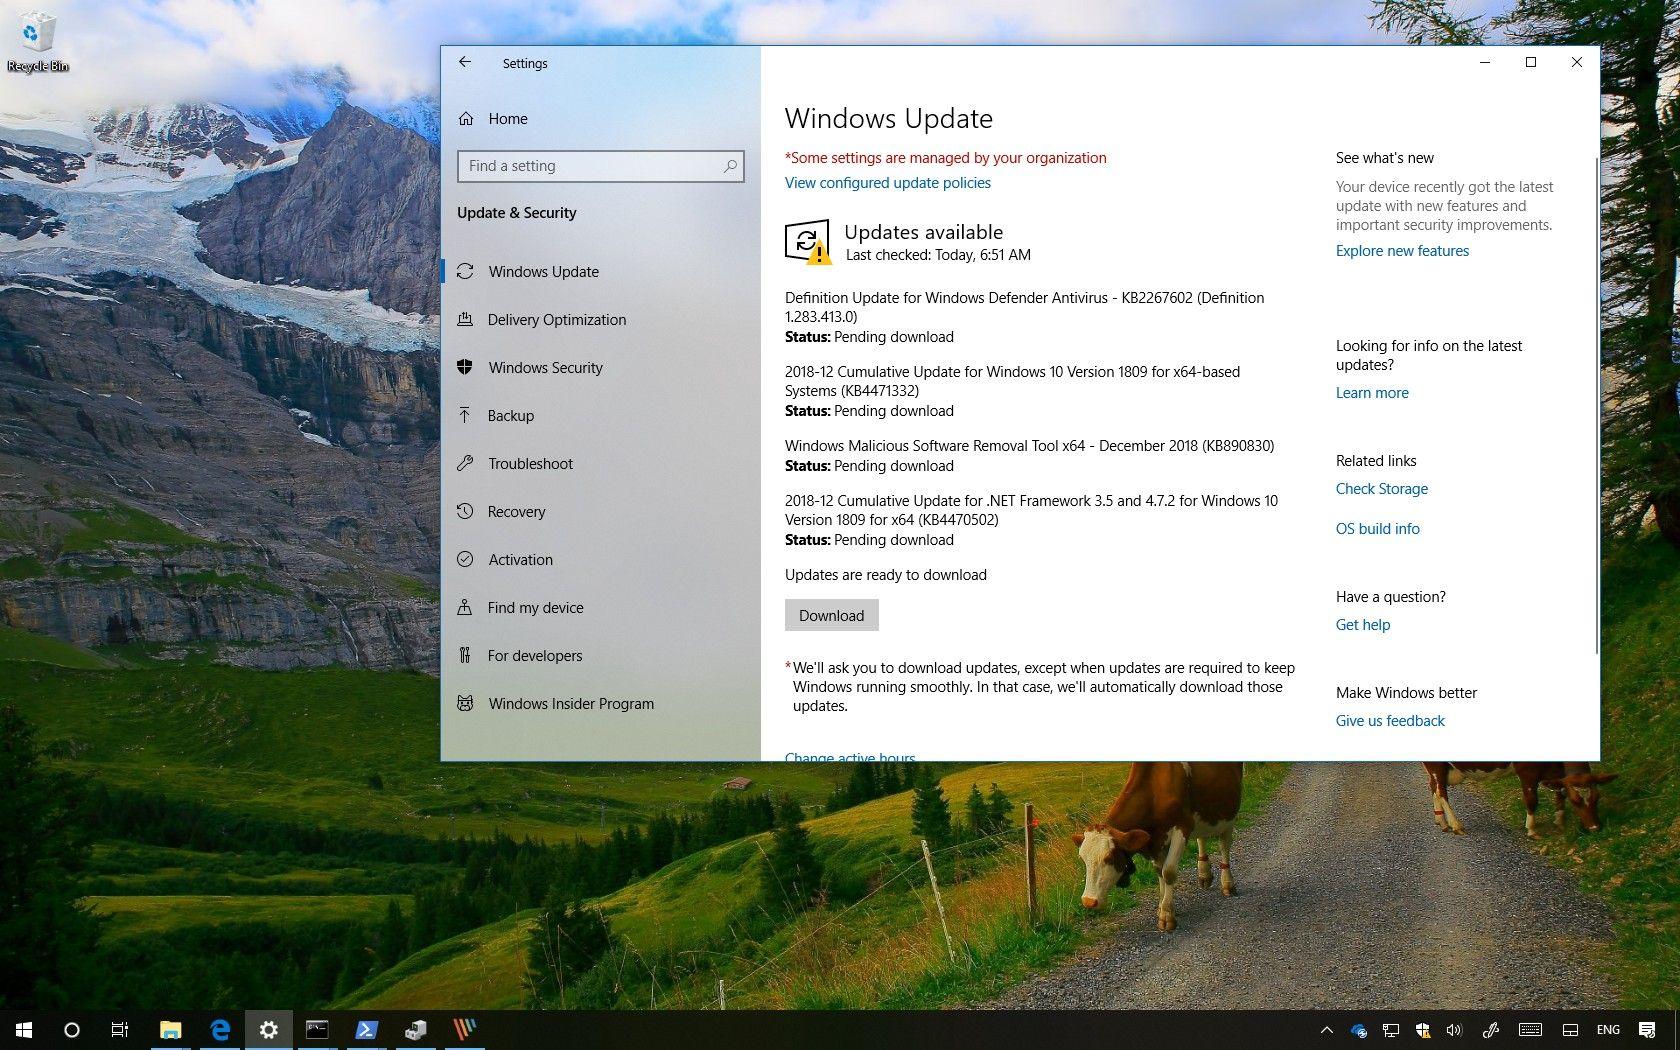 KB4471332 update for Windows 10 version 1809